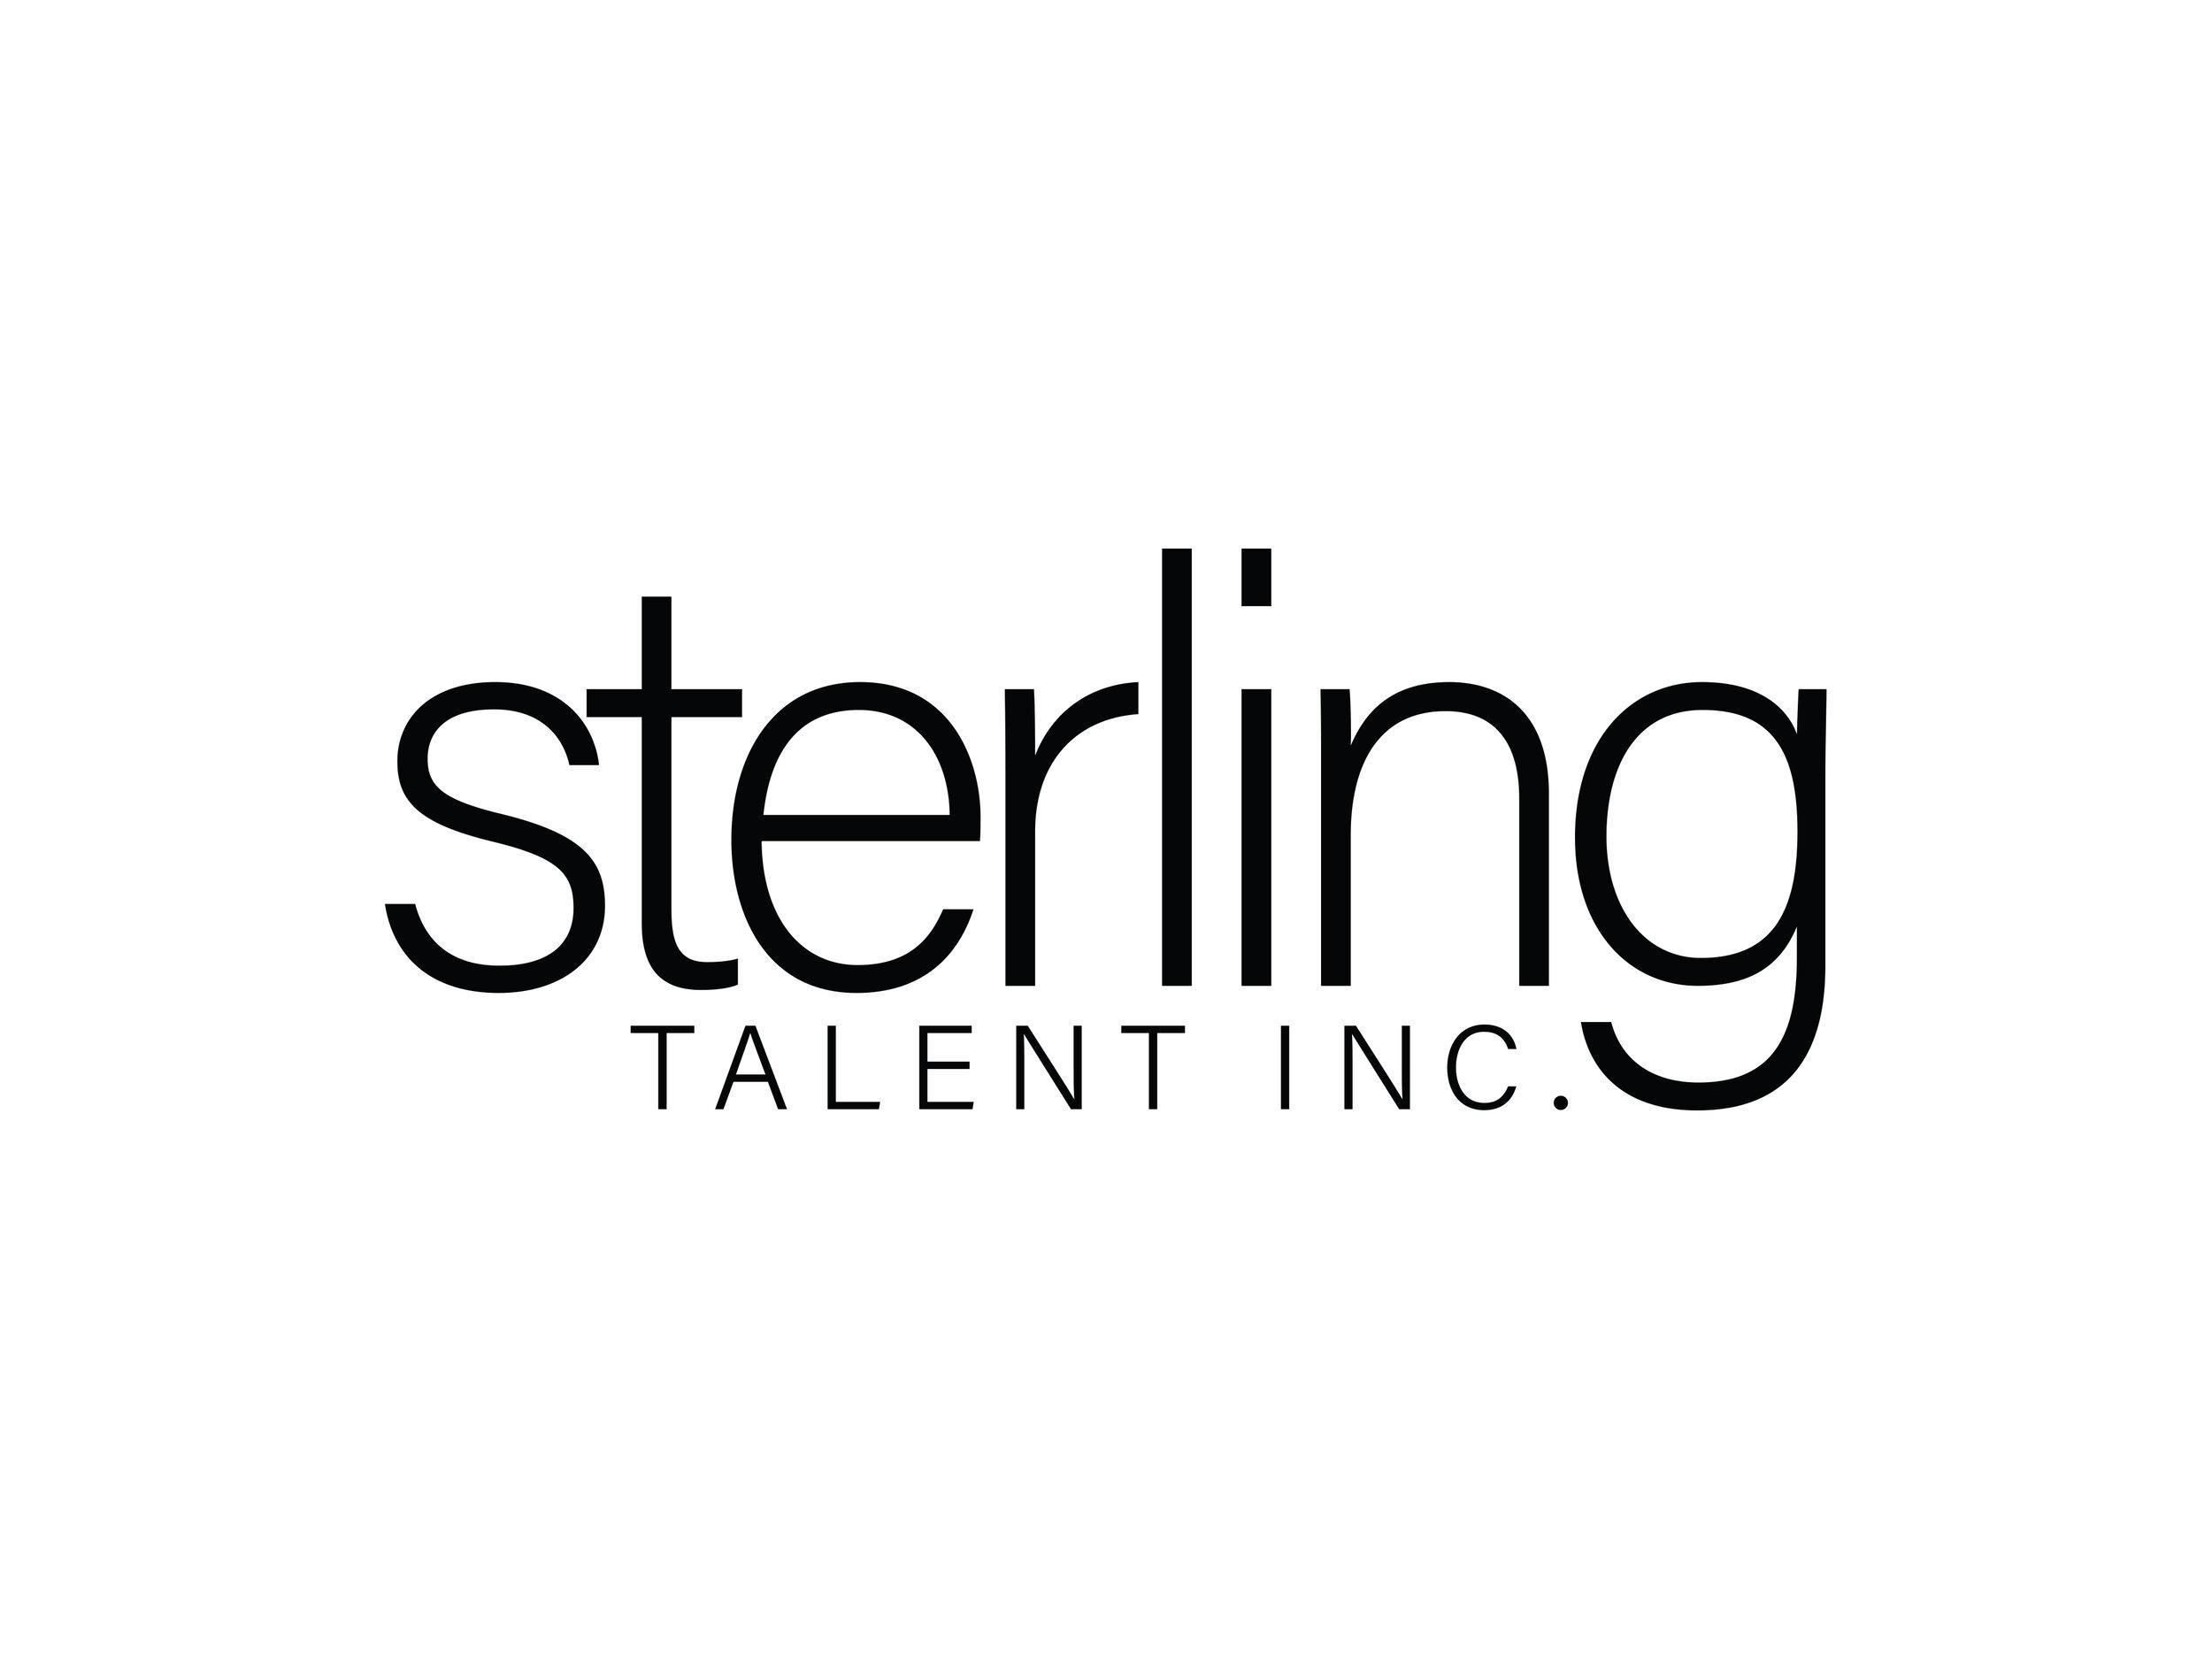 SterlingTalentLogo.jpg